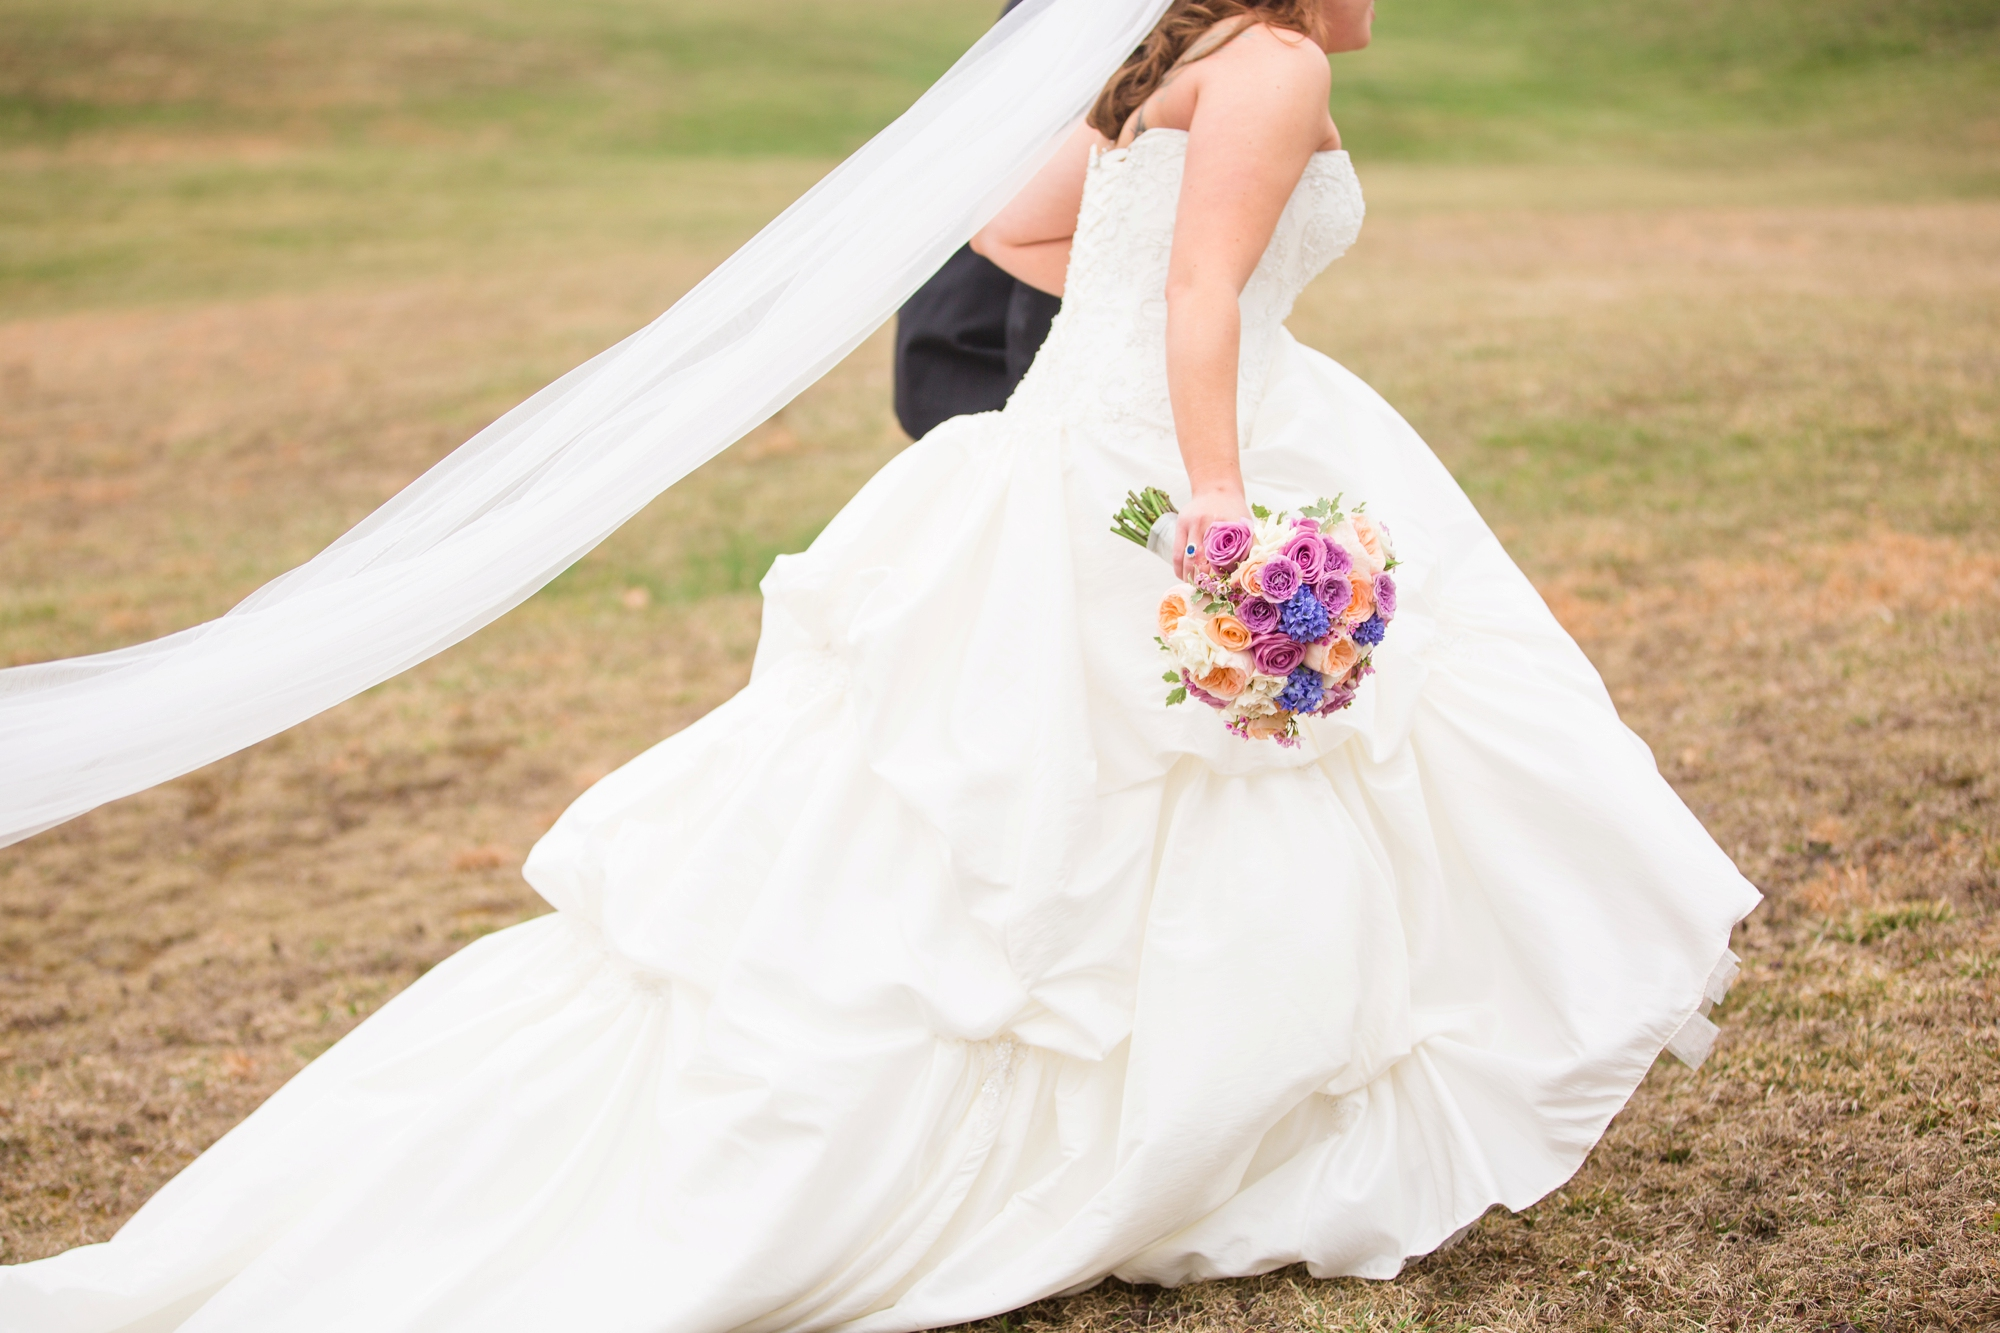 pittsburgh wedding photographer, pittsburgh wedding venues, pittsburgh wedding photos, white barn wedding photos